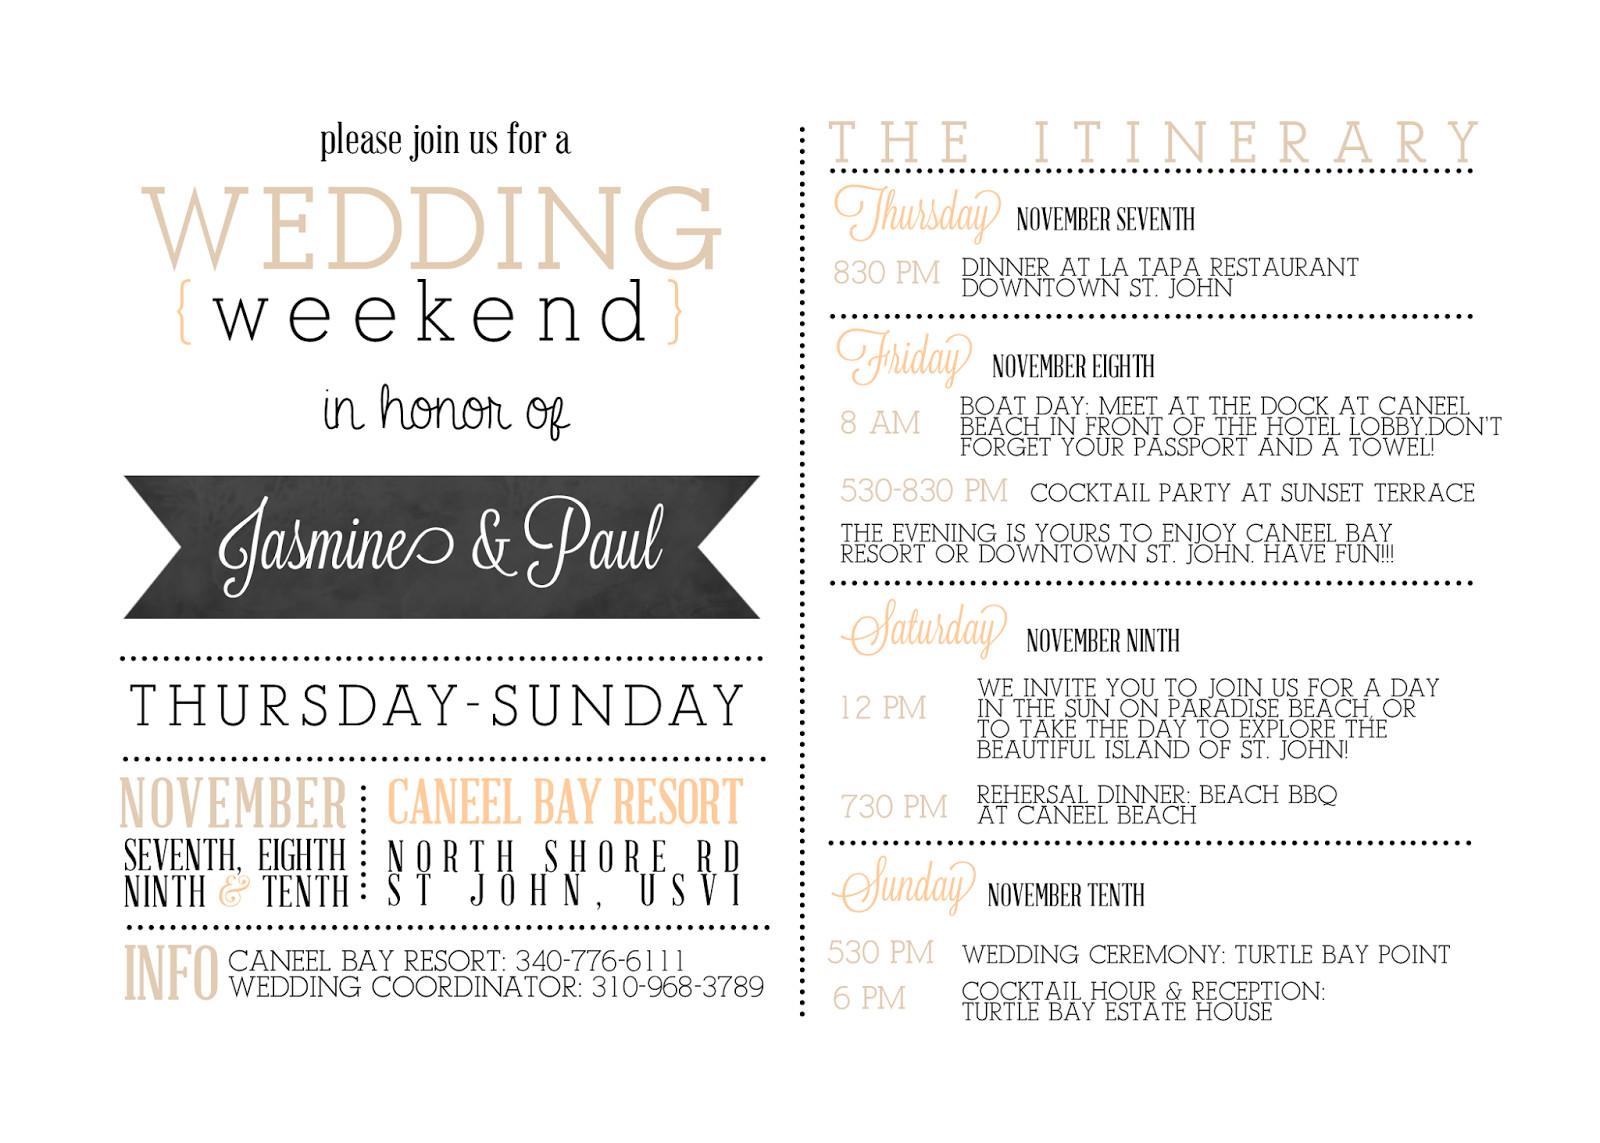 Wedding Weekend Itinerary Template Sugar Queens Custom Wedding Wel E Cards